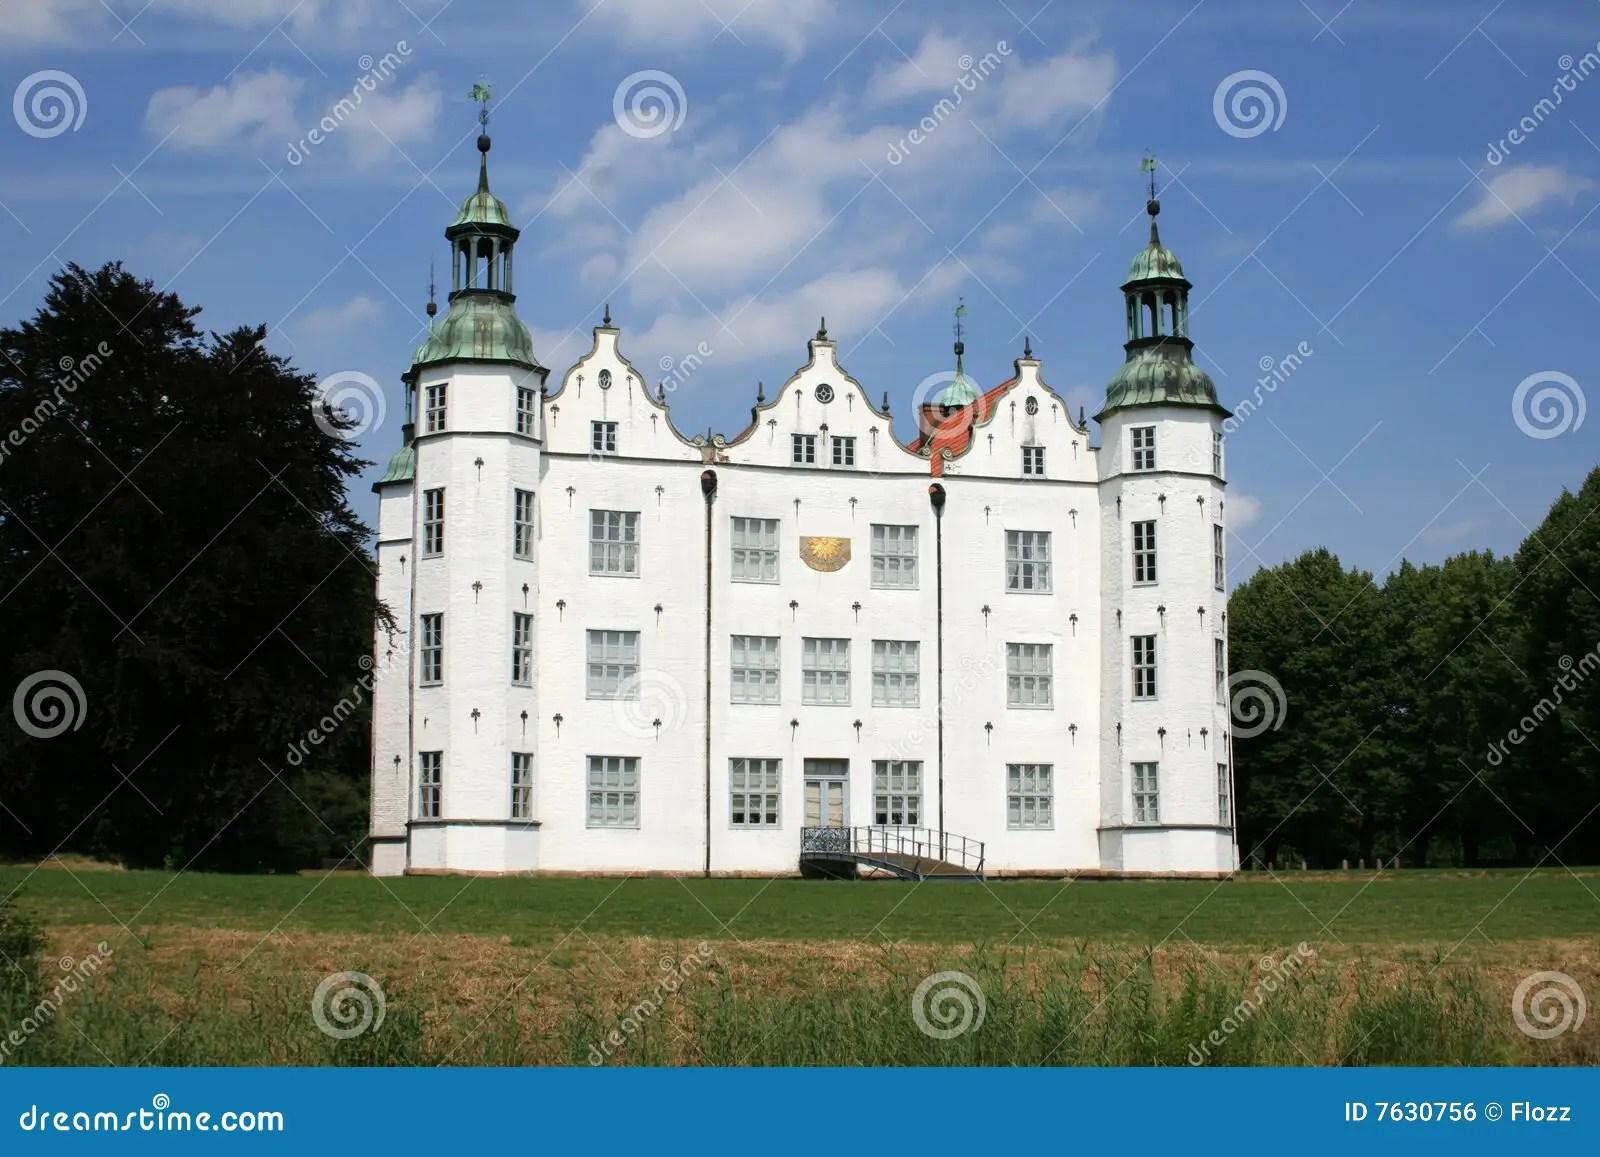 castle ahrensburg stock photo